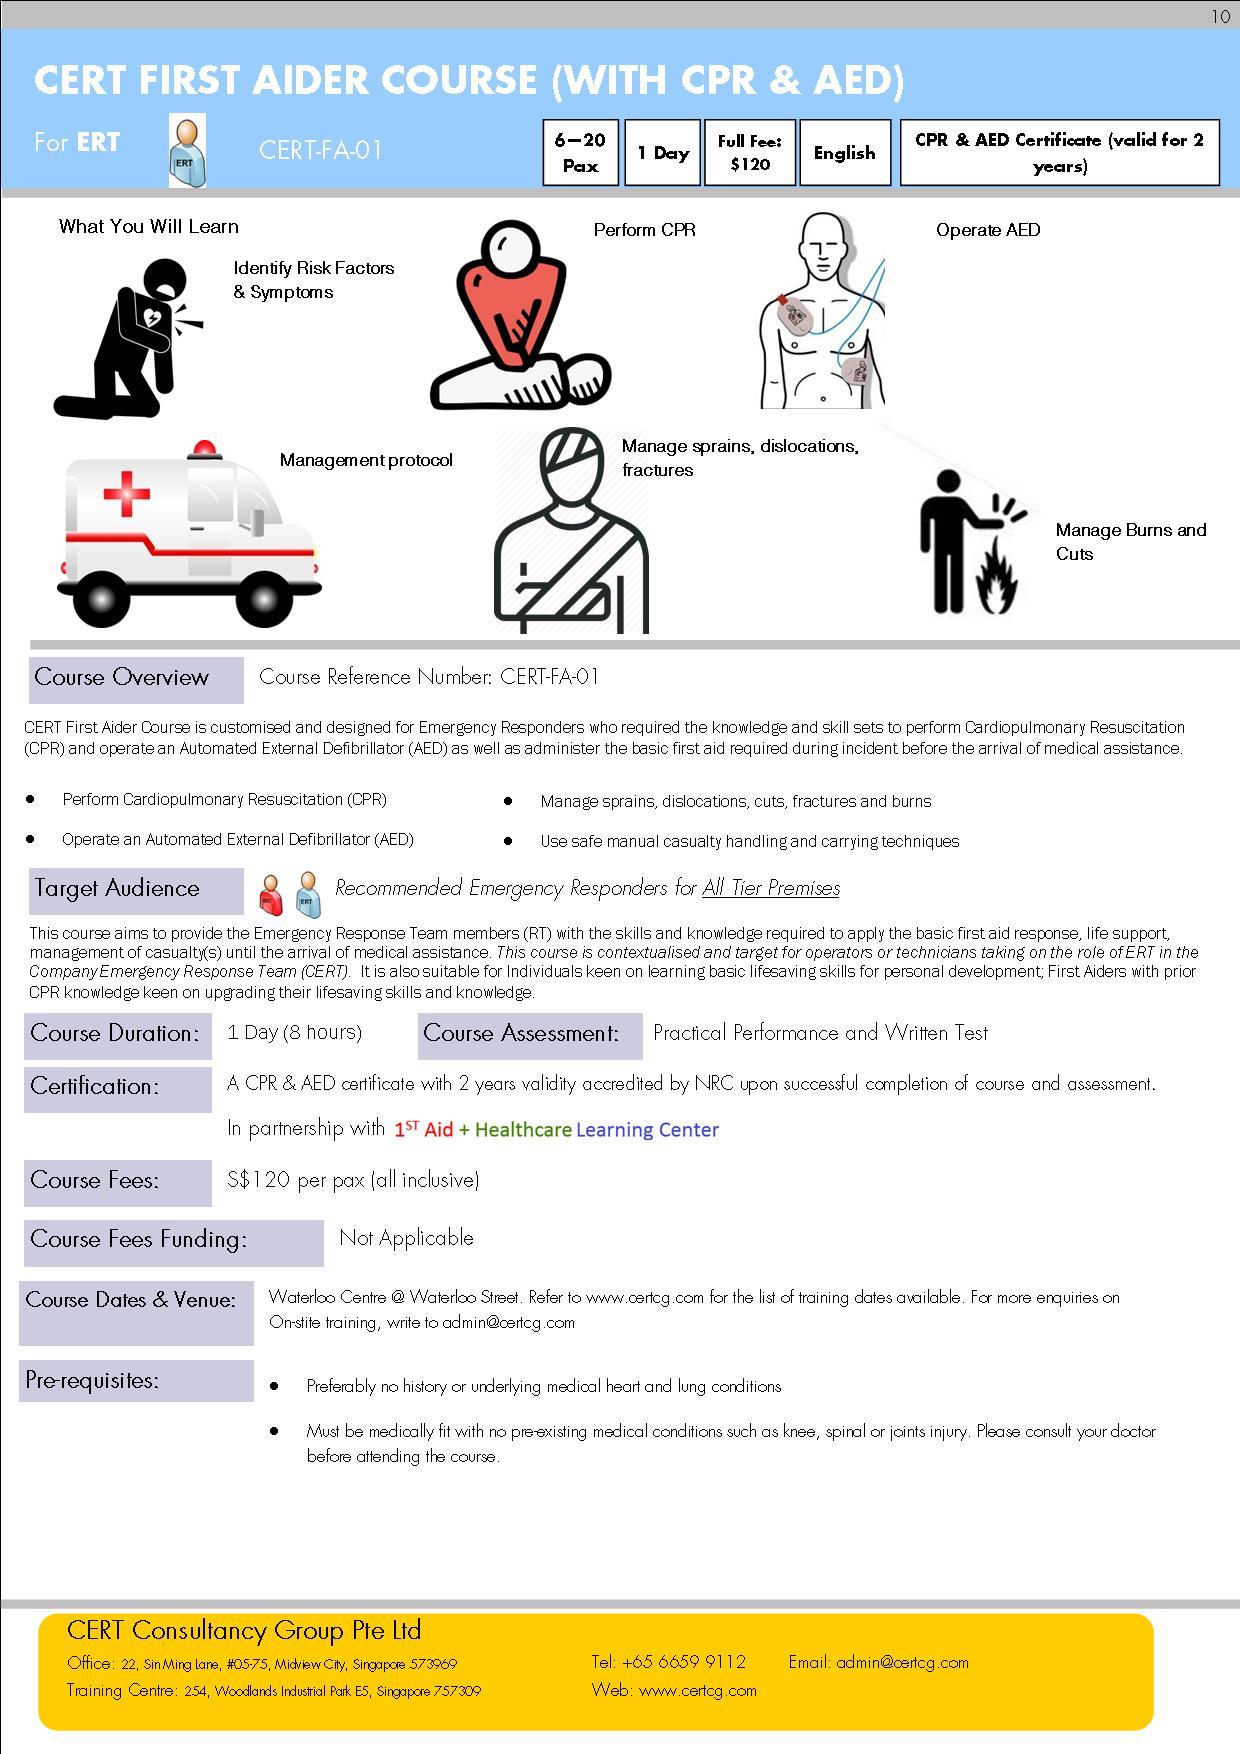 Cert first aider course cert fa 01 register run 10 registration cert first aid cpr aed xflitez Gallery